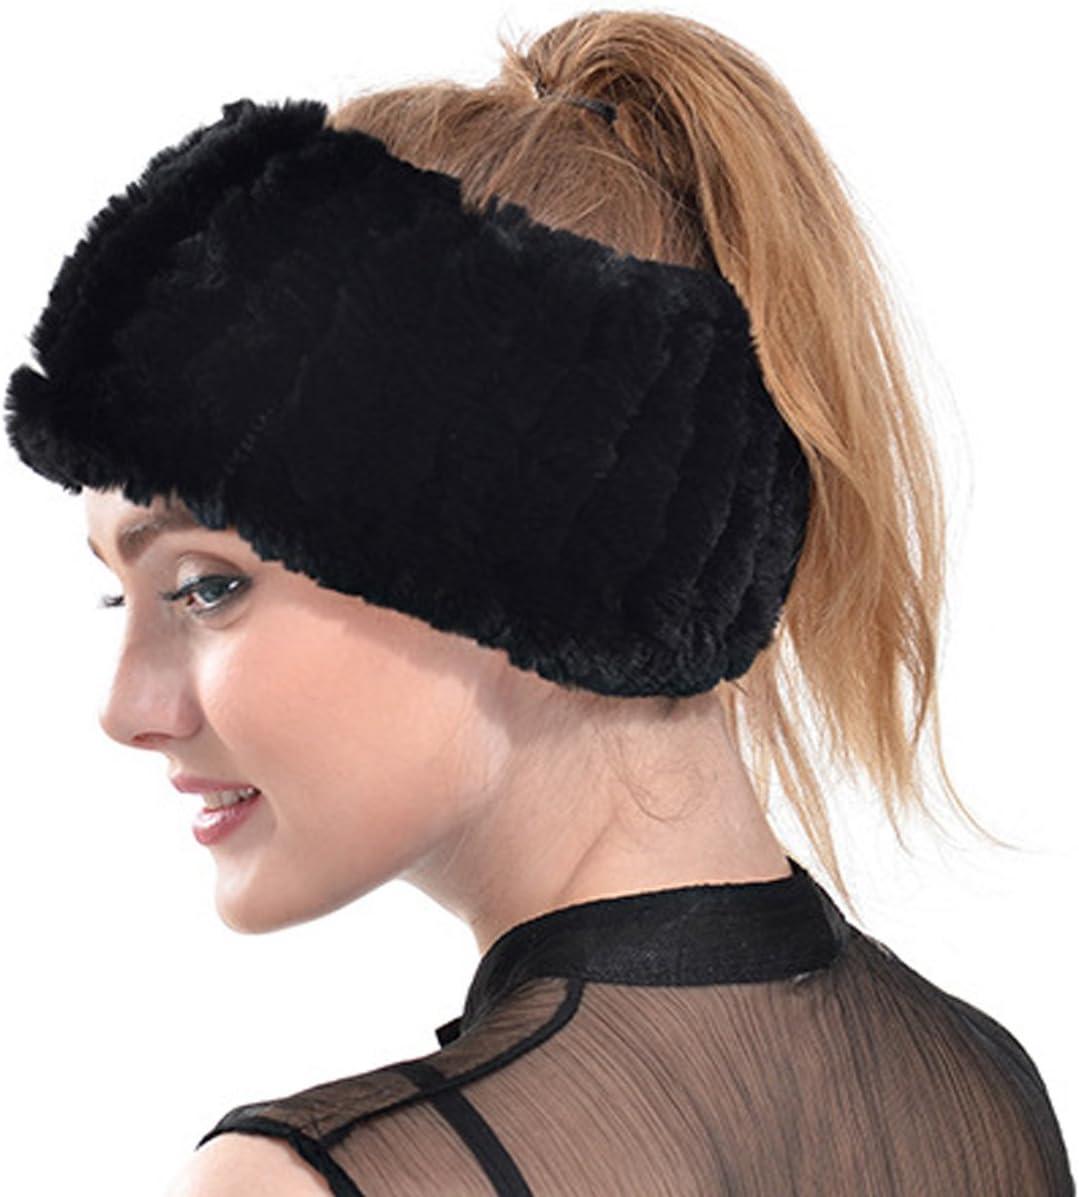 Black Rabbit Fur Neck Warmer,Patedan Elastic Winter Knit Hat Headband Scarf Muffler